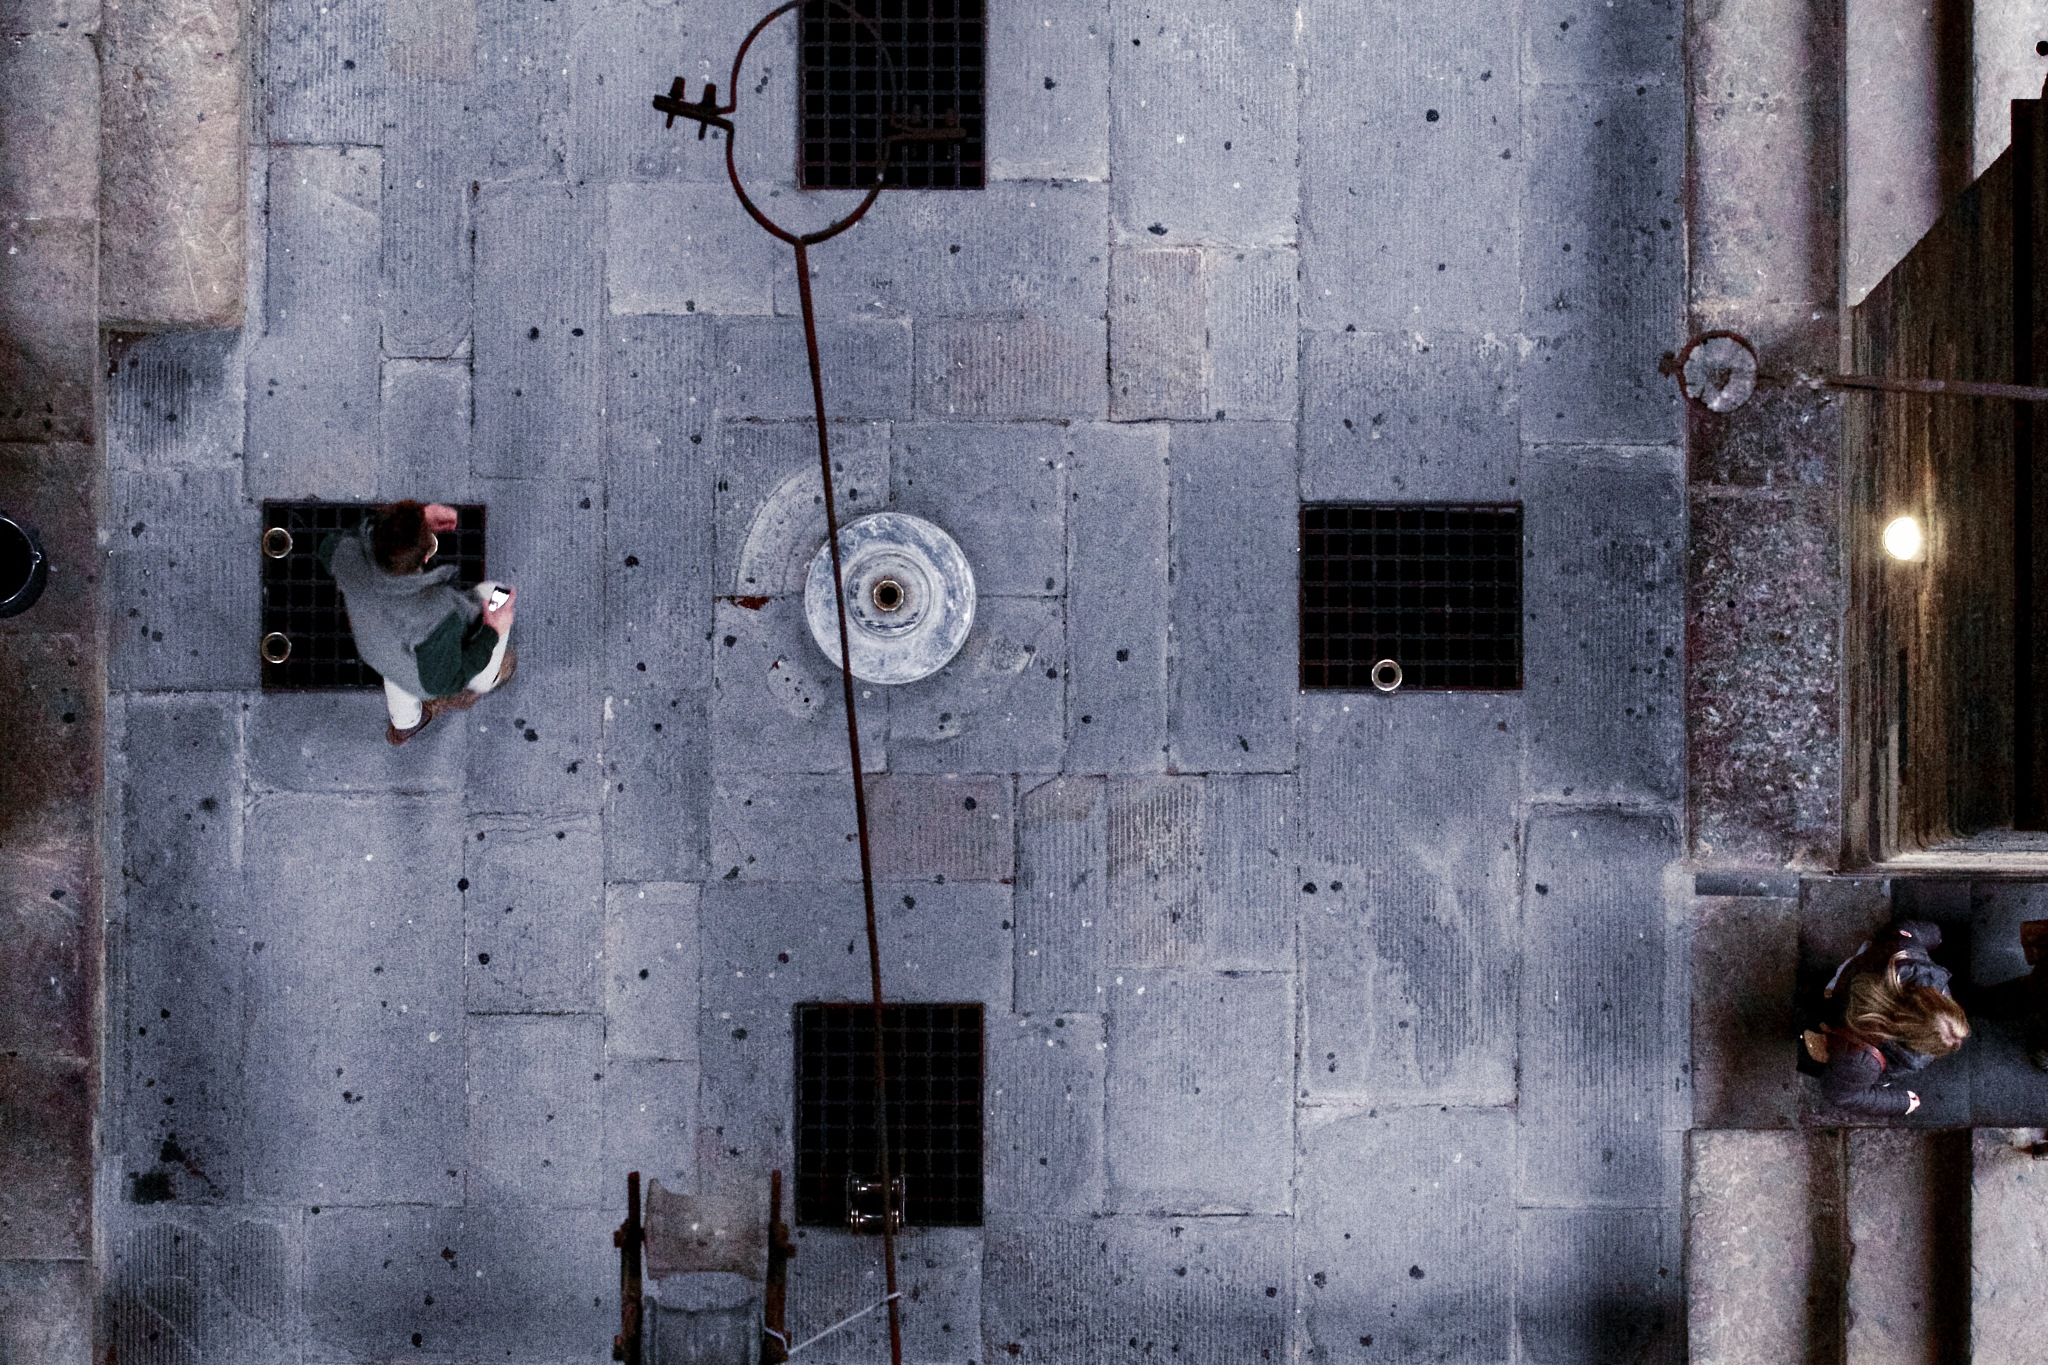 Uno sguardo dall'alto by MarkSoetebierVideophotography